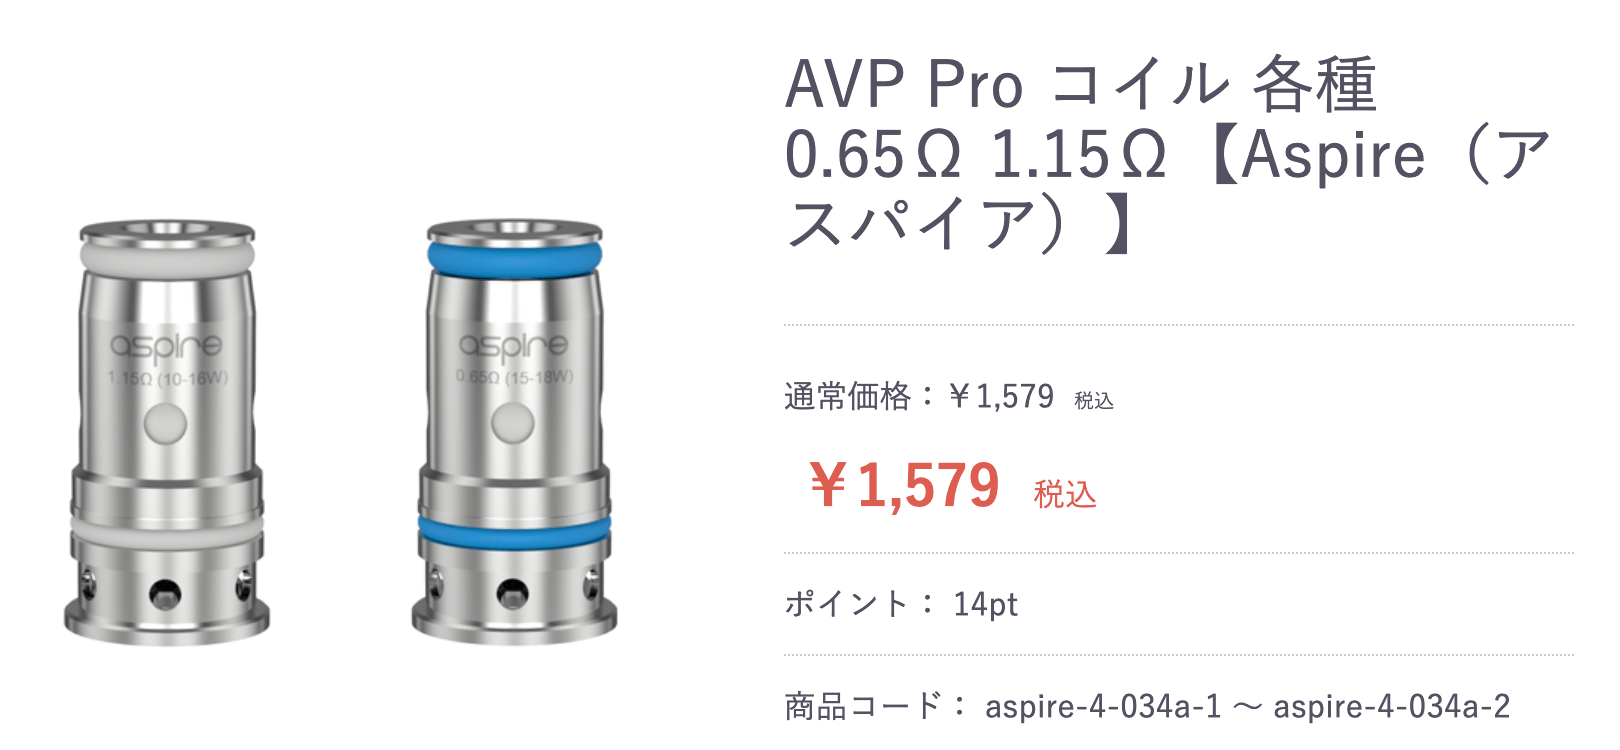 AVP Proコイルの販売ページ